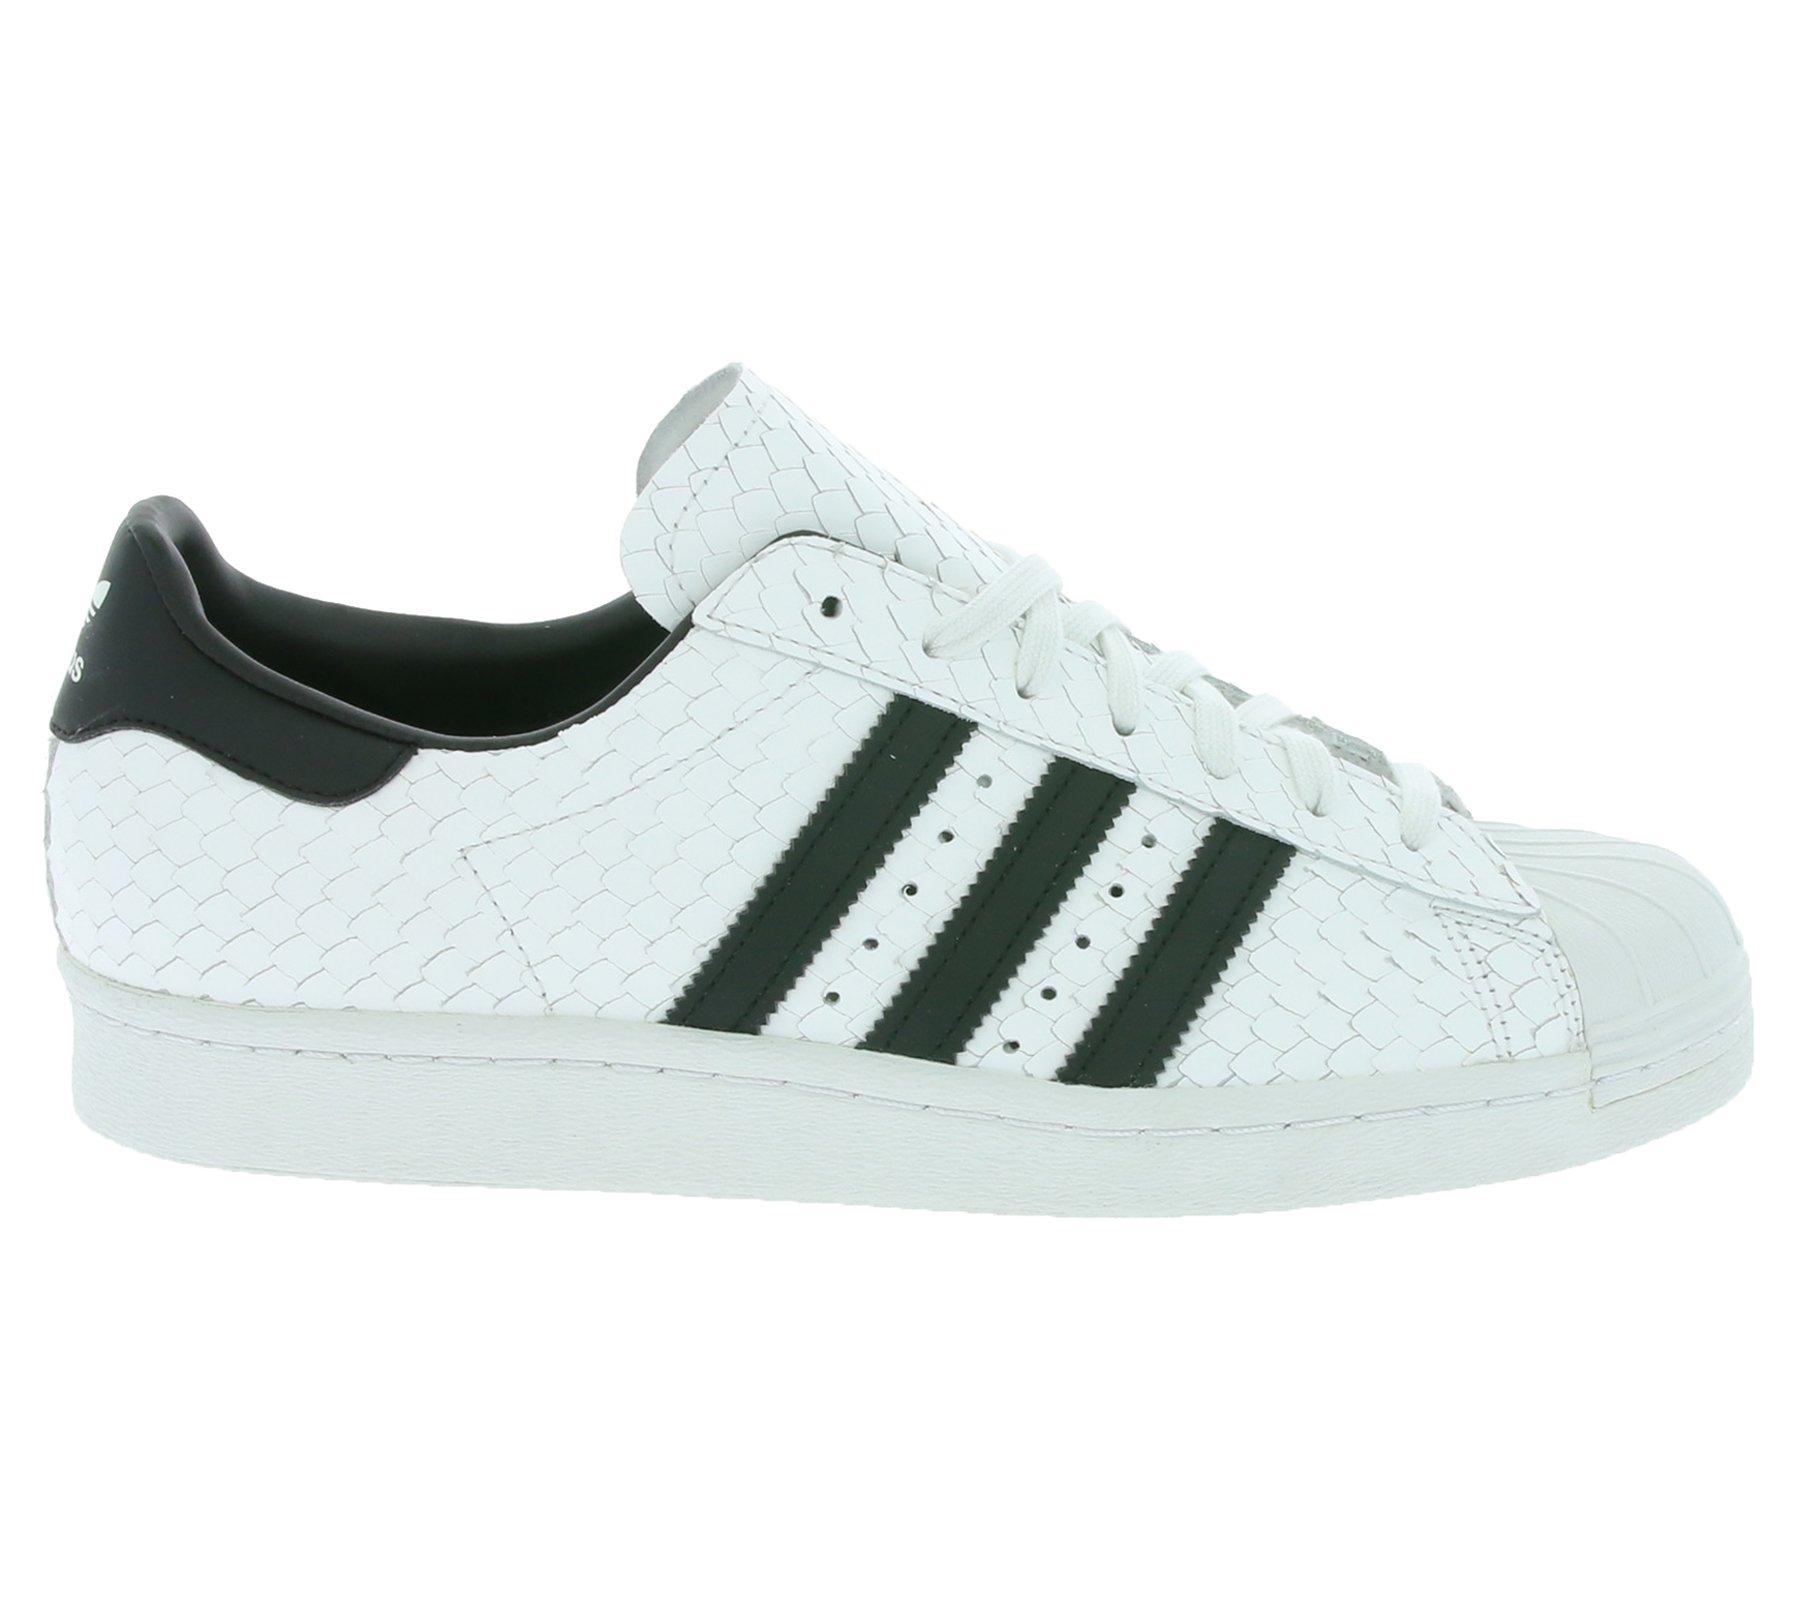 Uomini Scarpe Da Ginnastica Adidas Originali Superstar Anni 80 Uomo Sneaker Sneakers Bianche S75836, ...